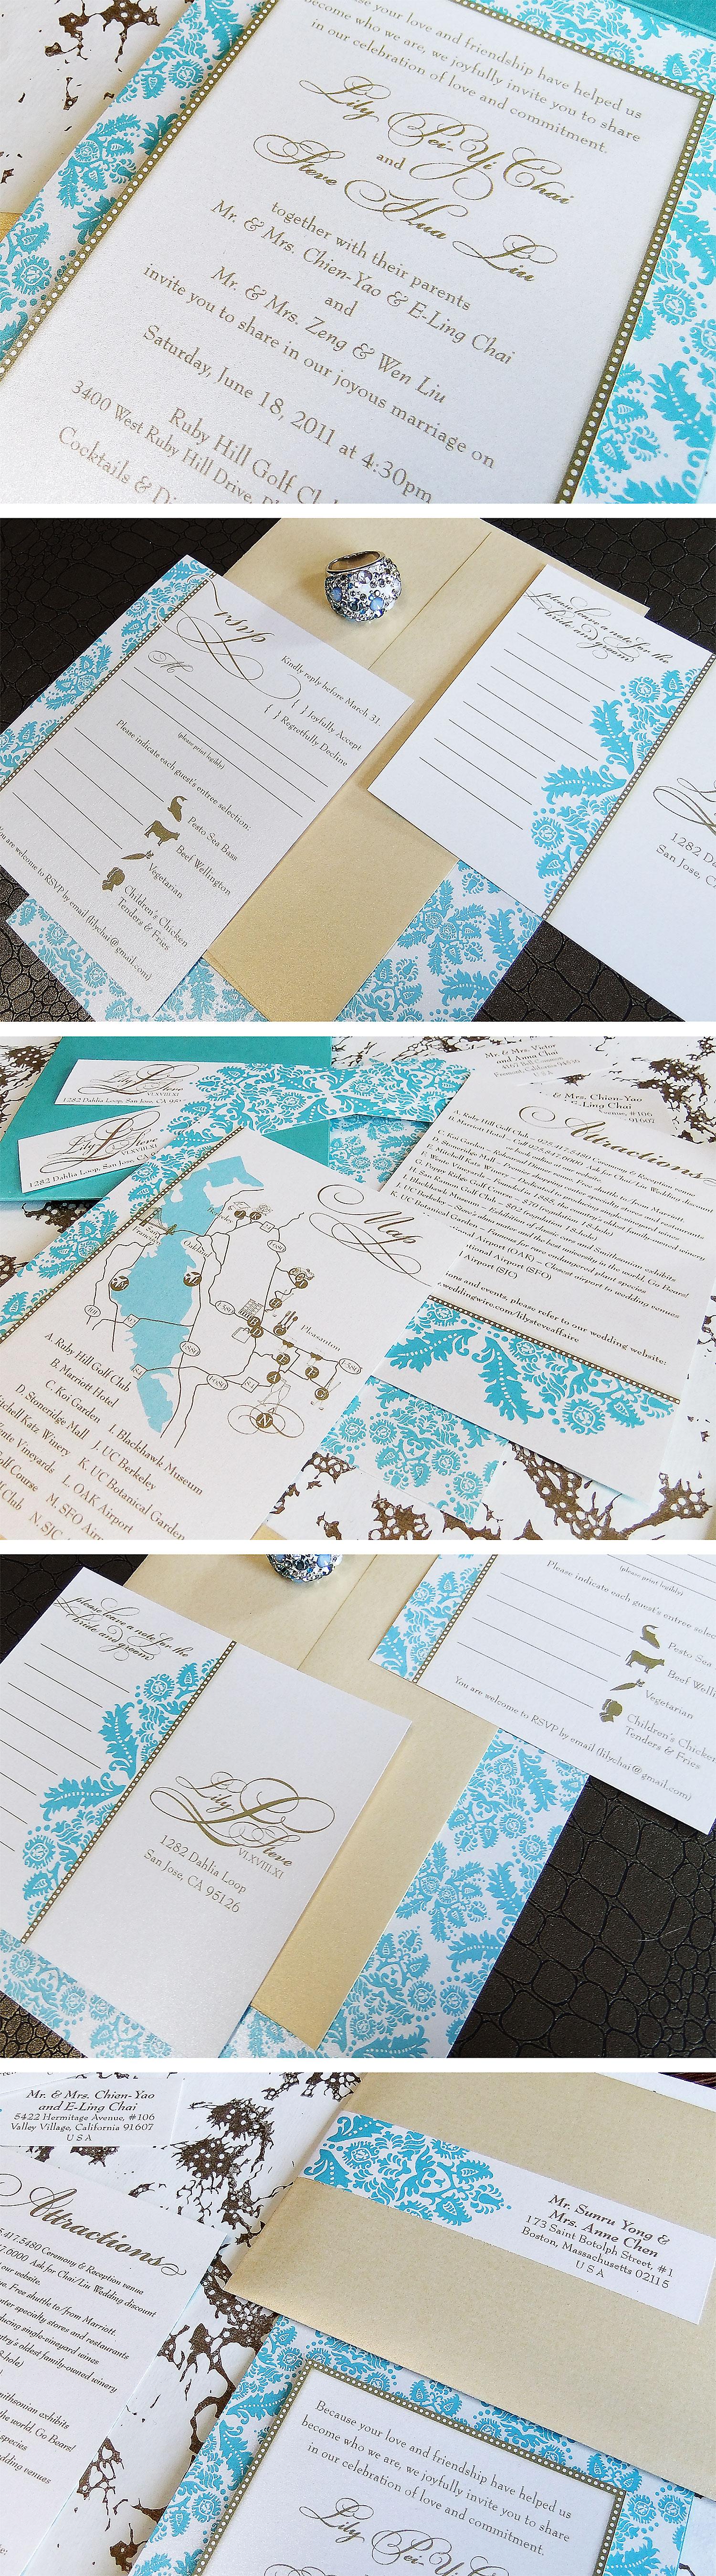 Elegant Damask Pocket Wedding Invitation By Emily Edson Design Https